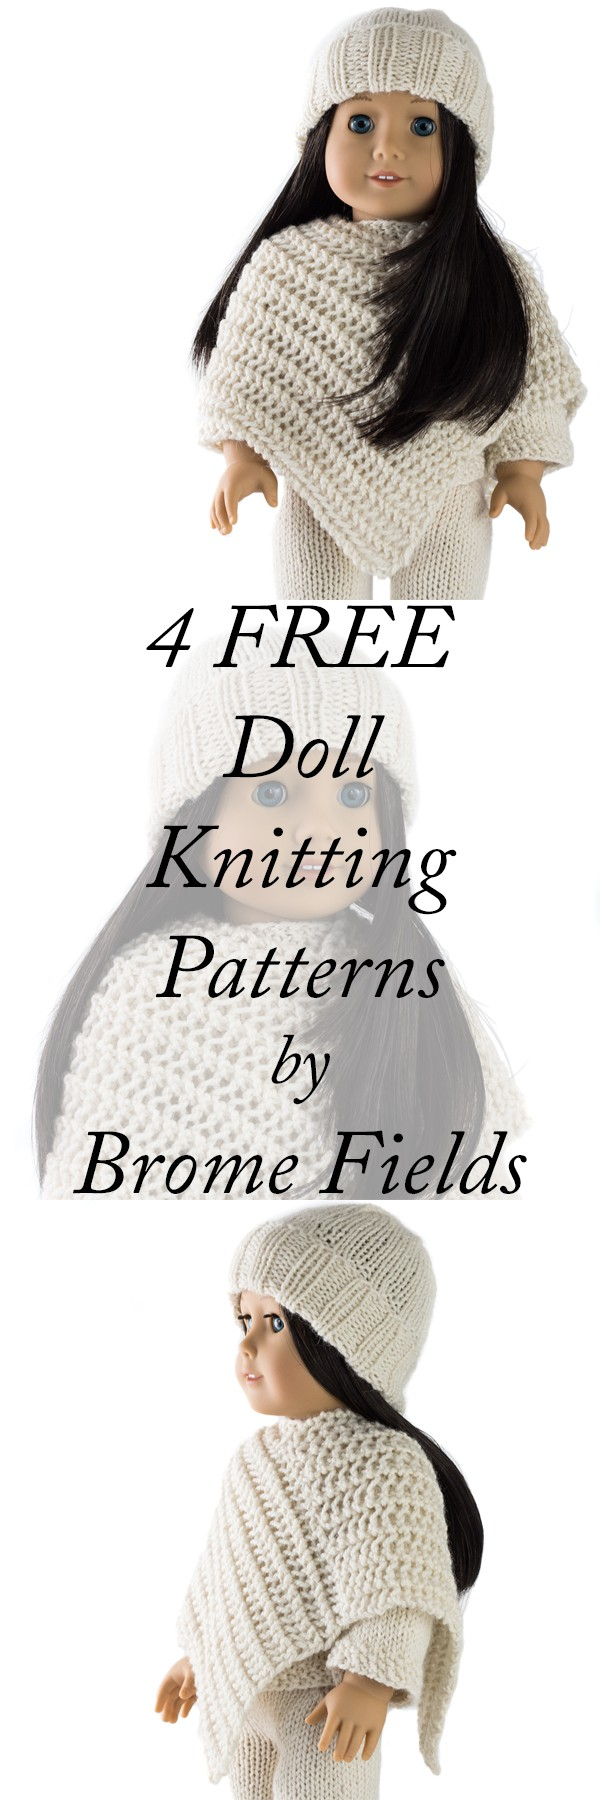 4 FREE American Doll Knitting Patterns